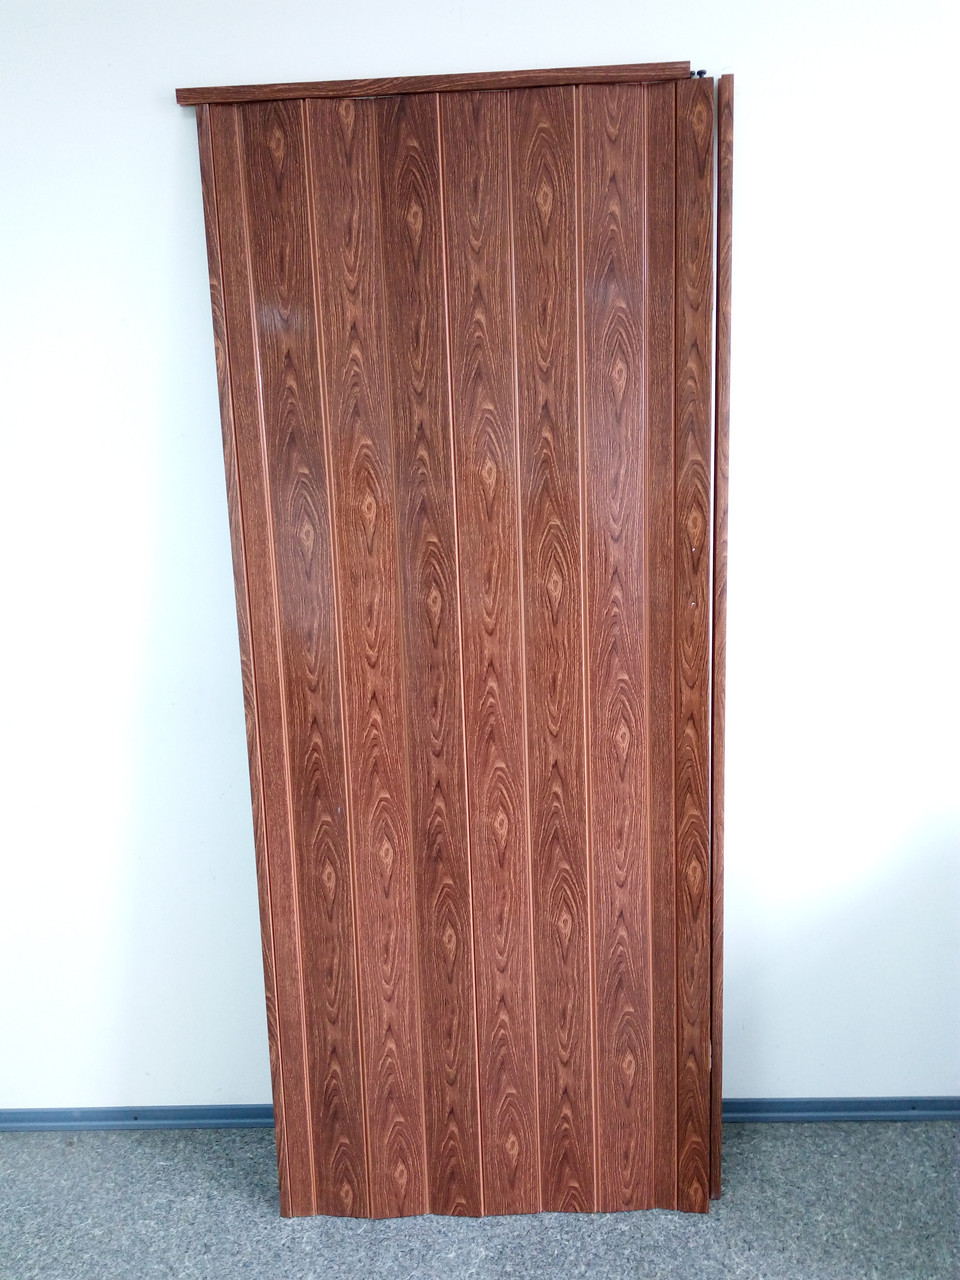 Дверь гармошка межкомнатная глухая, черешня 7107, 810*2030*6 мм